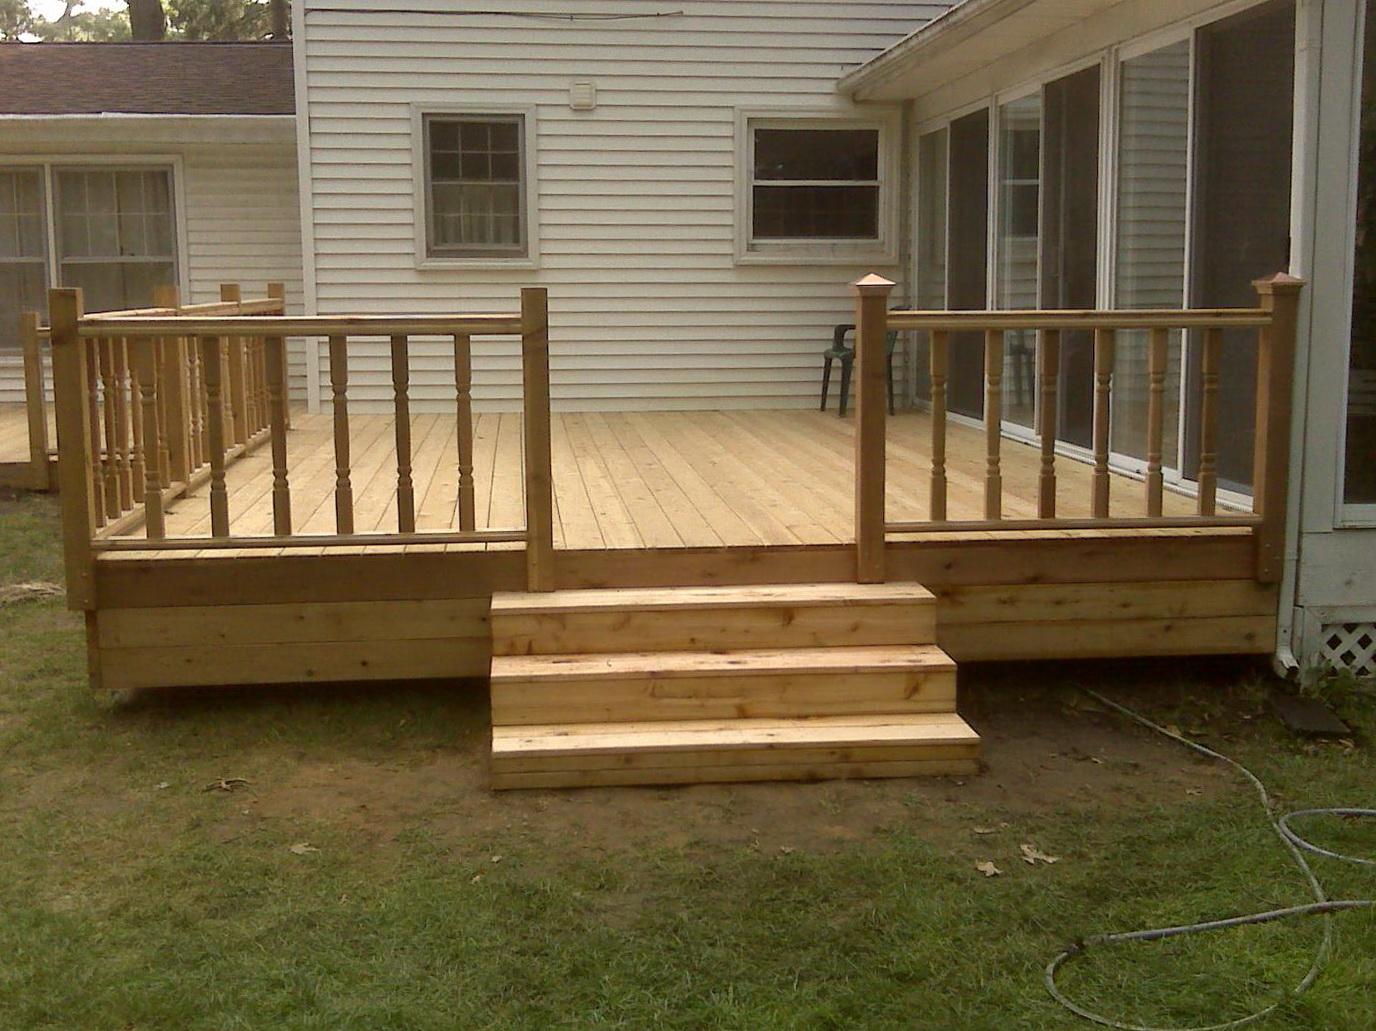 Simple Wood Deck Designs | Home Design Ideas on Wood Deck Ideas For Backyard  id=65385